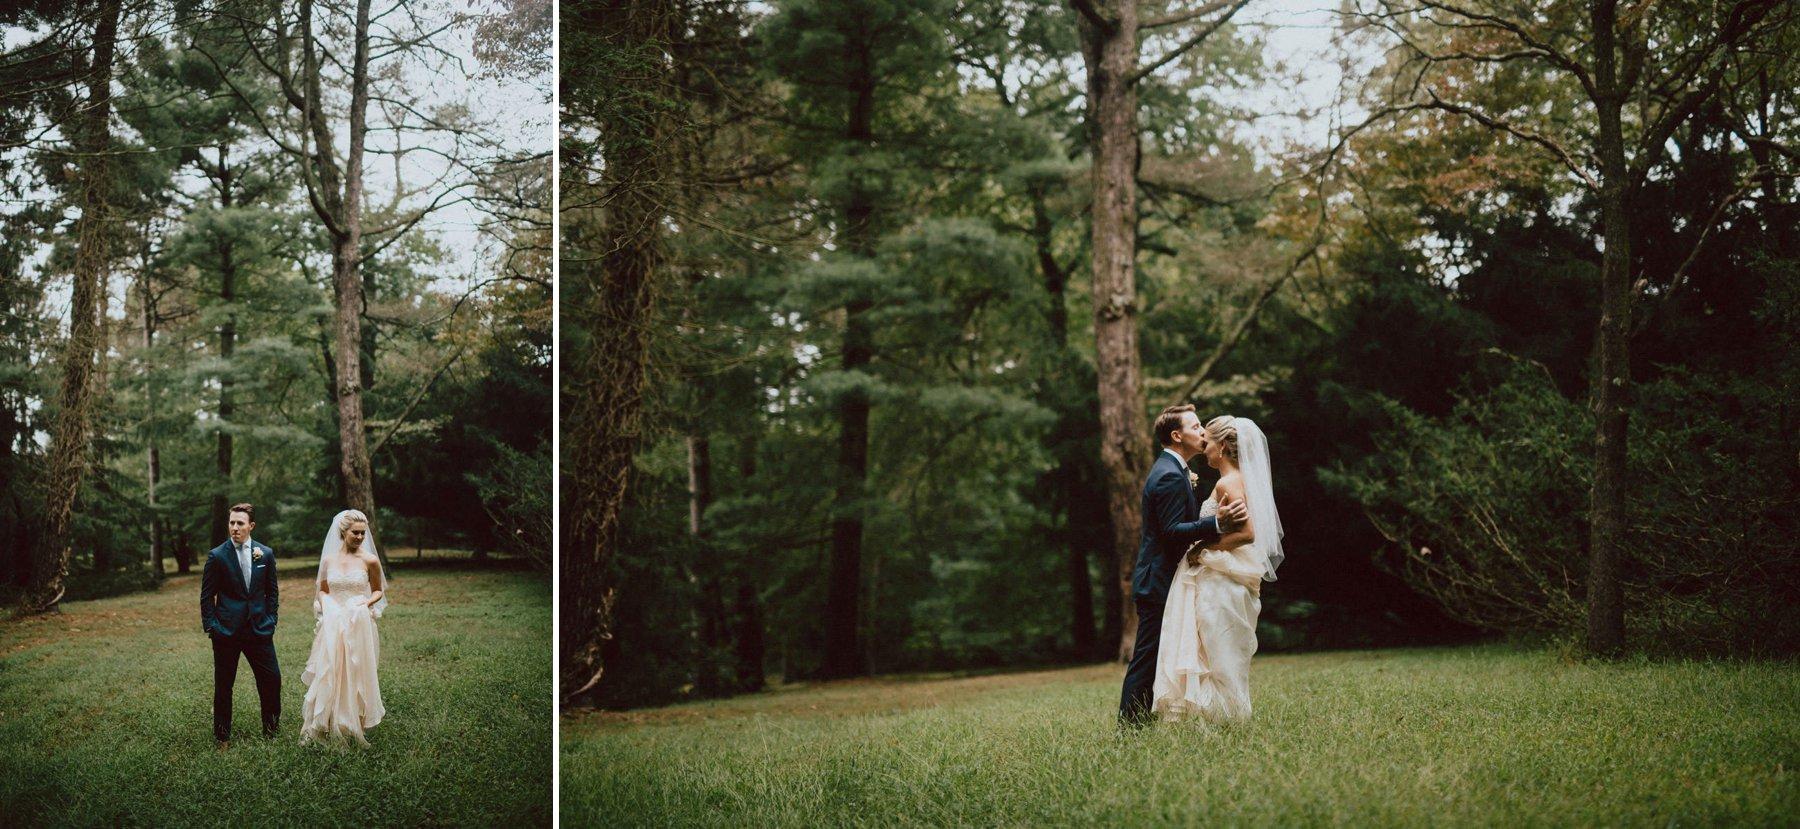 greenville-country-club-wedding-84.jpg